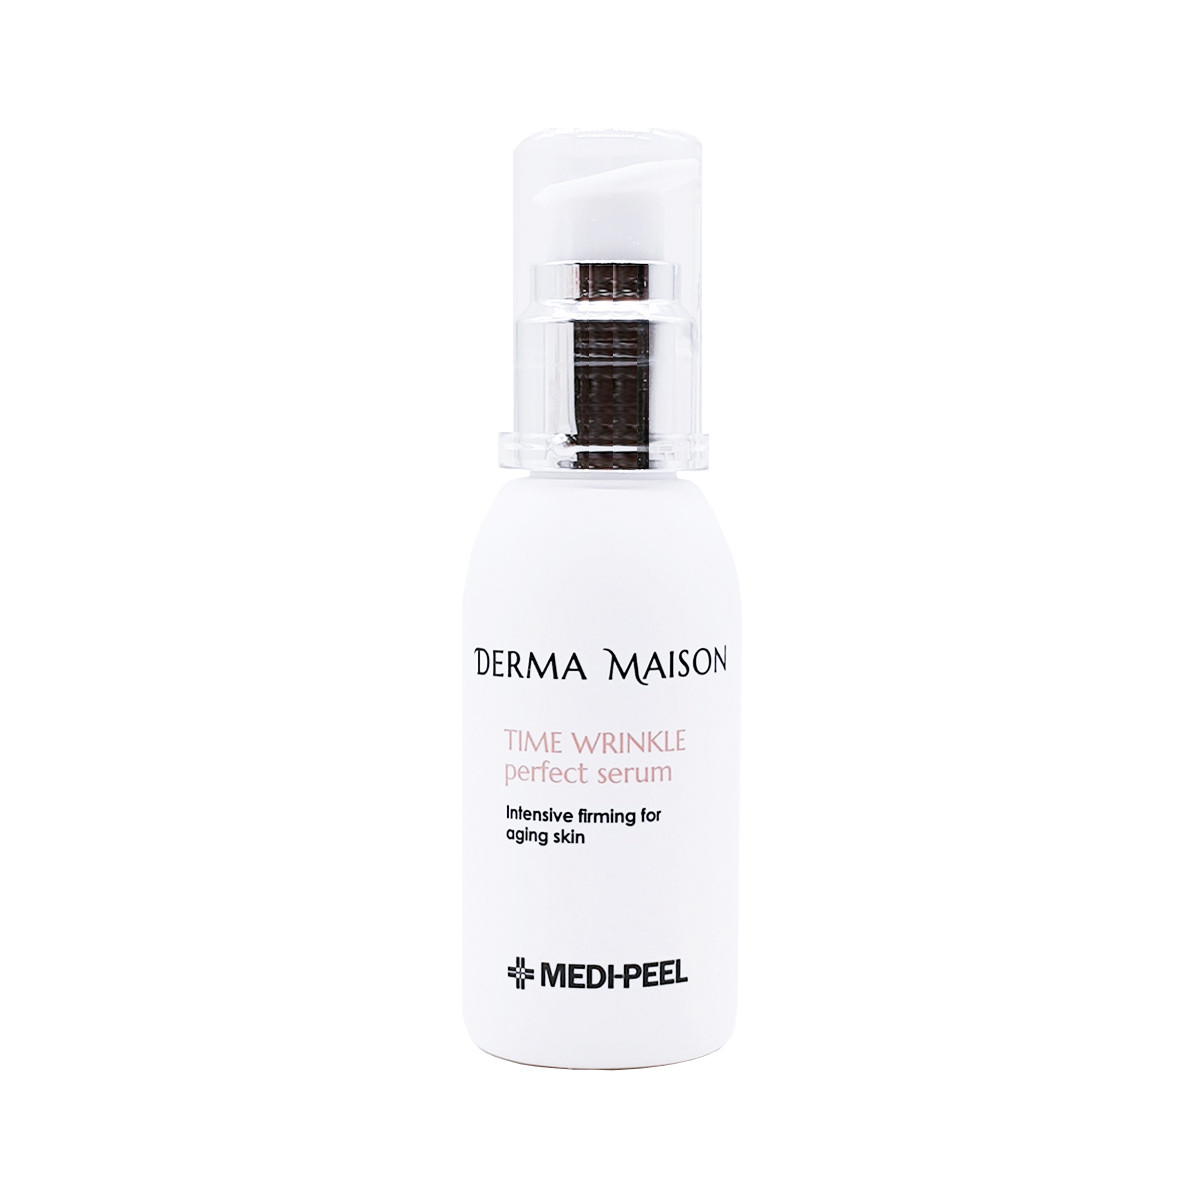 Medi Peel Антиоксидантная сыворотка с токоферолом Derma Maison Time Wrinkle Perfect Serum 50мл.